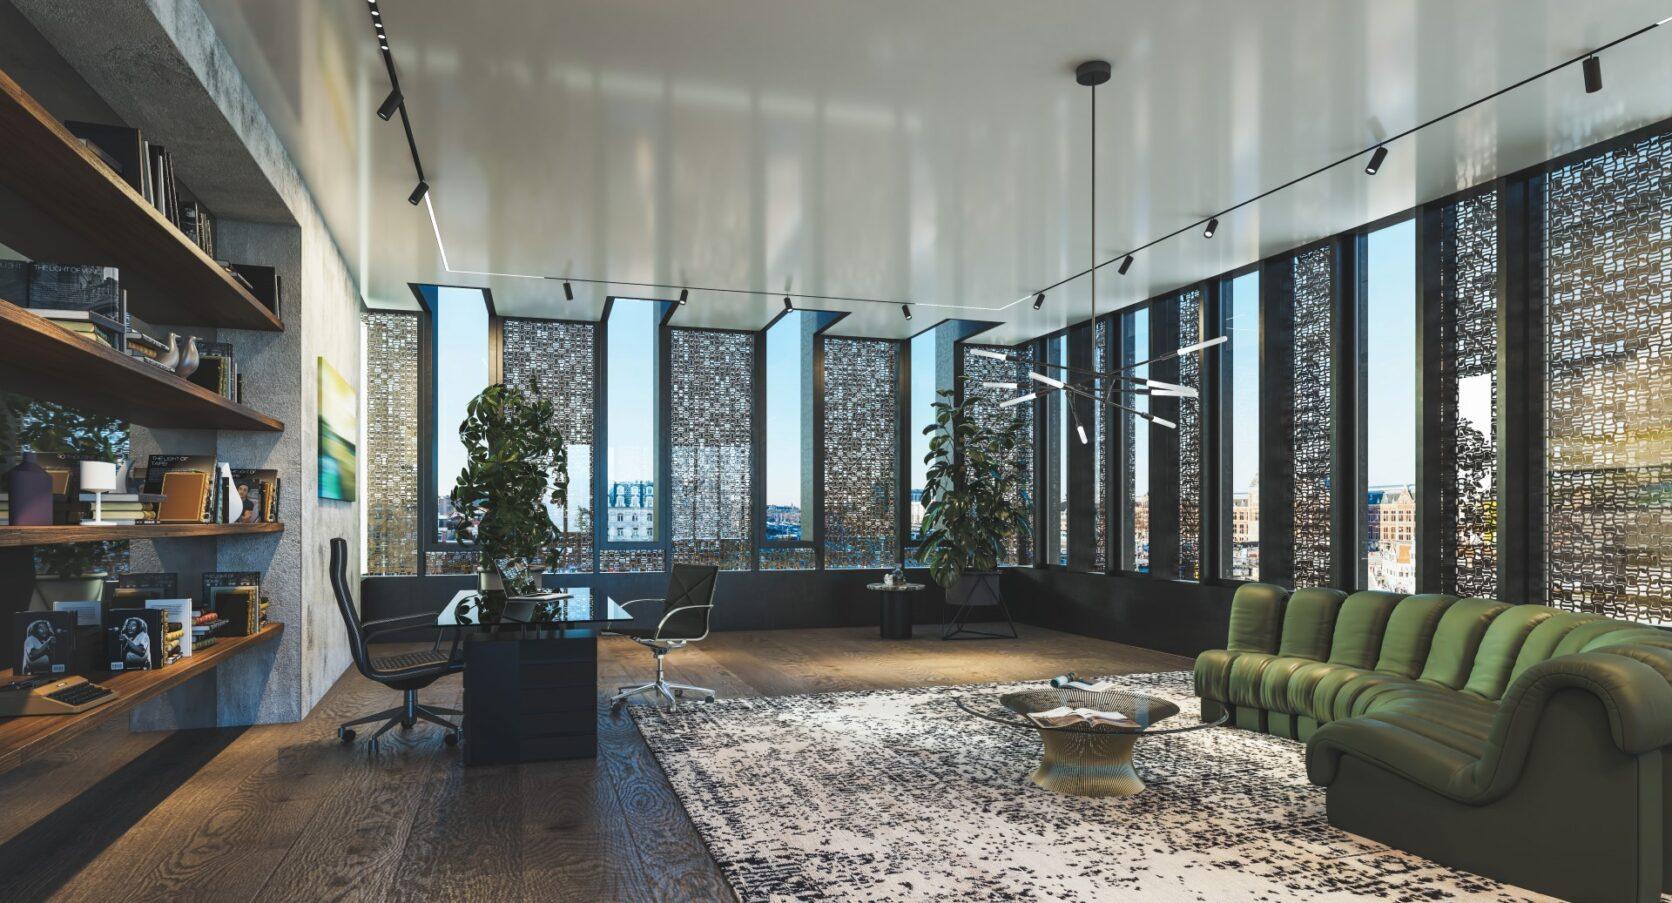 MD Formatura gevelbekleding Prins Hendrinkkade Amsterdam interieur